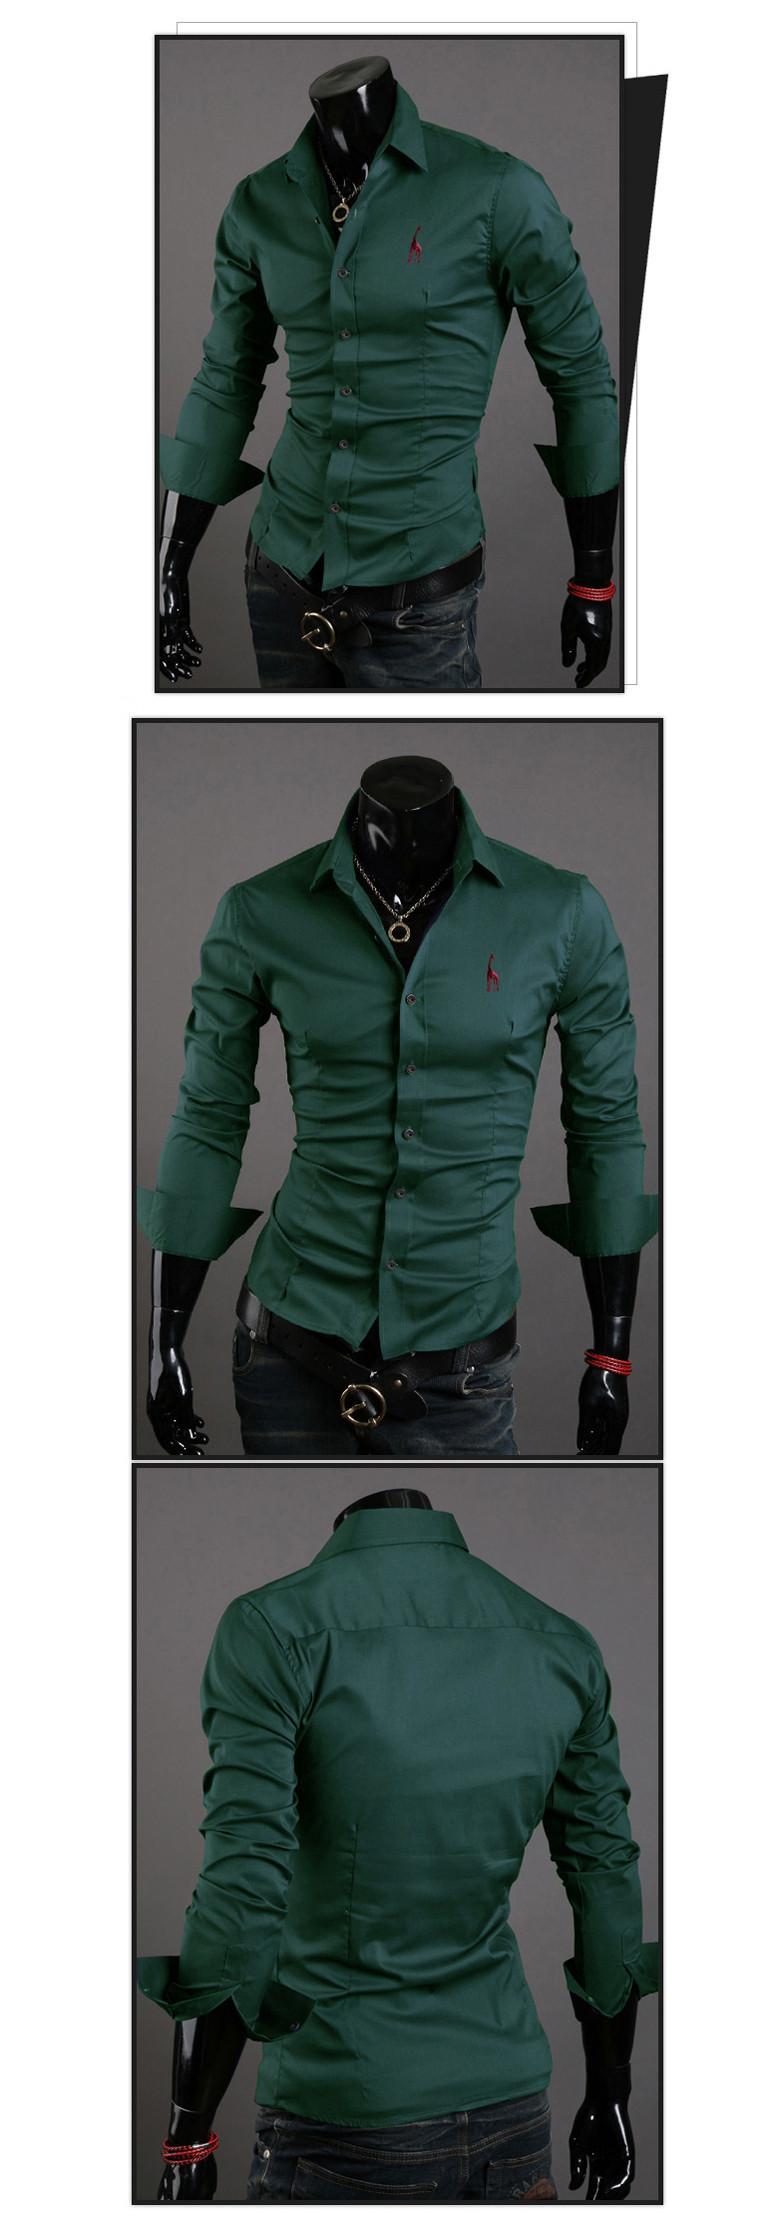 camisa social verde, #camisasocialverde, camisa social verde musgo, camisa social verde militar, camisa verde masculina